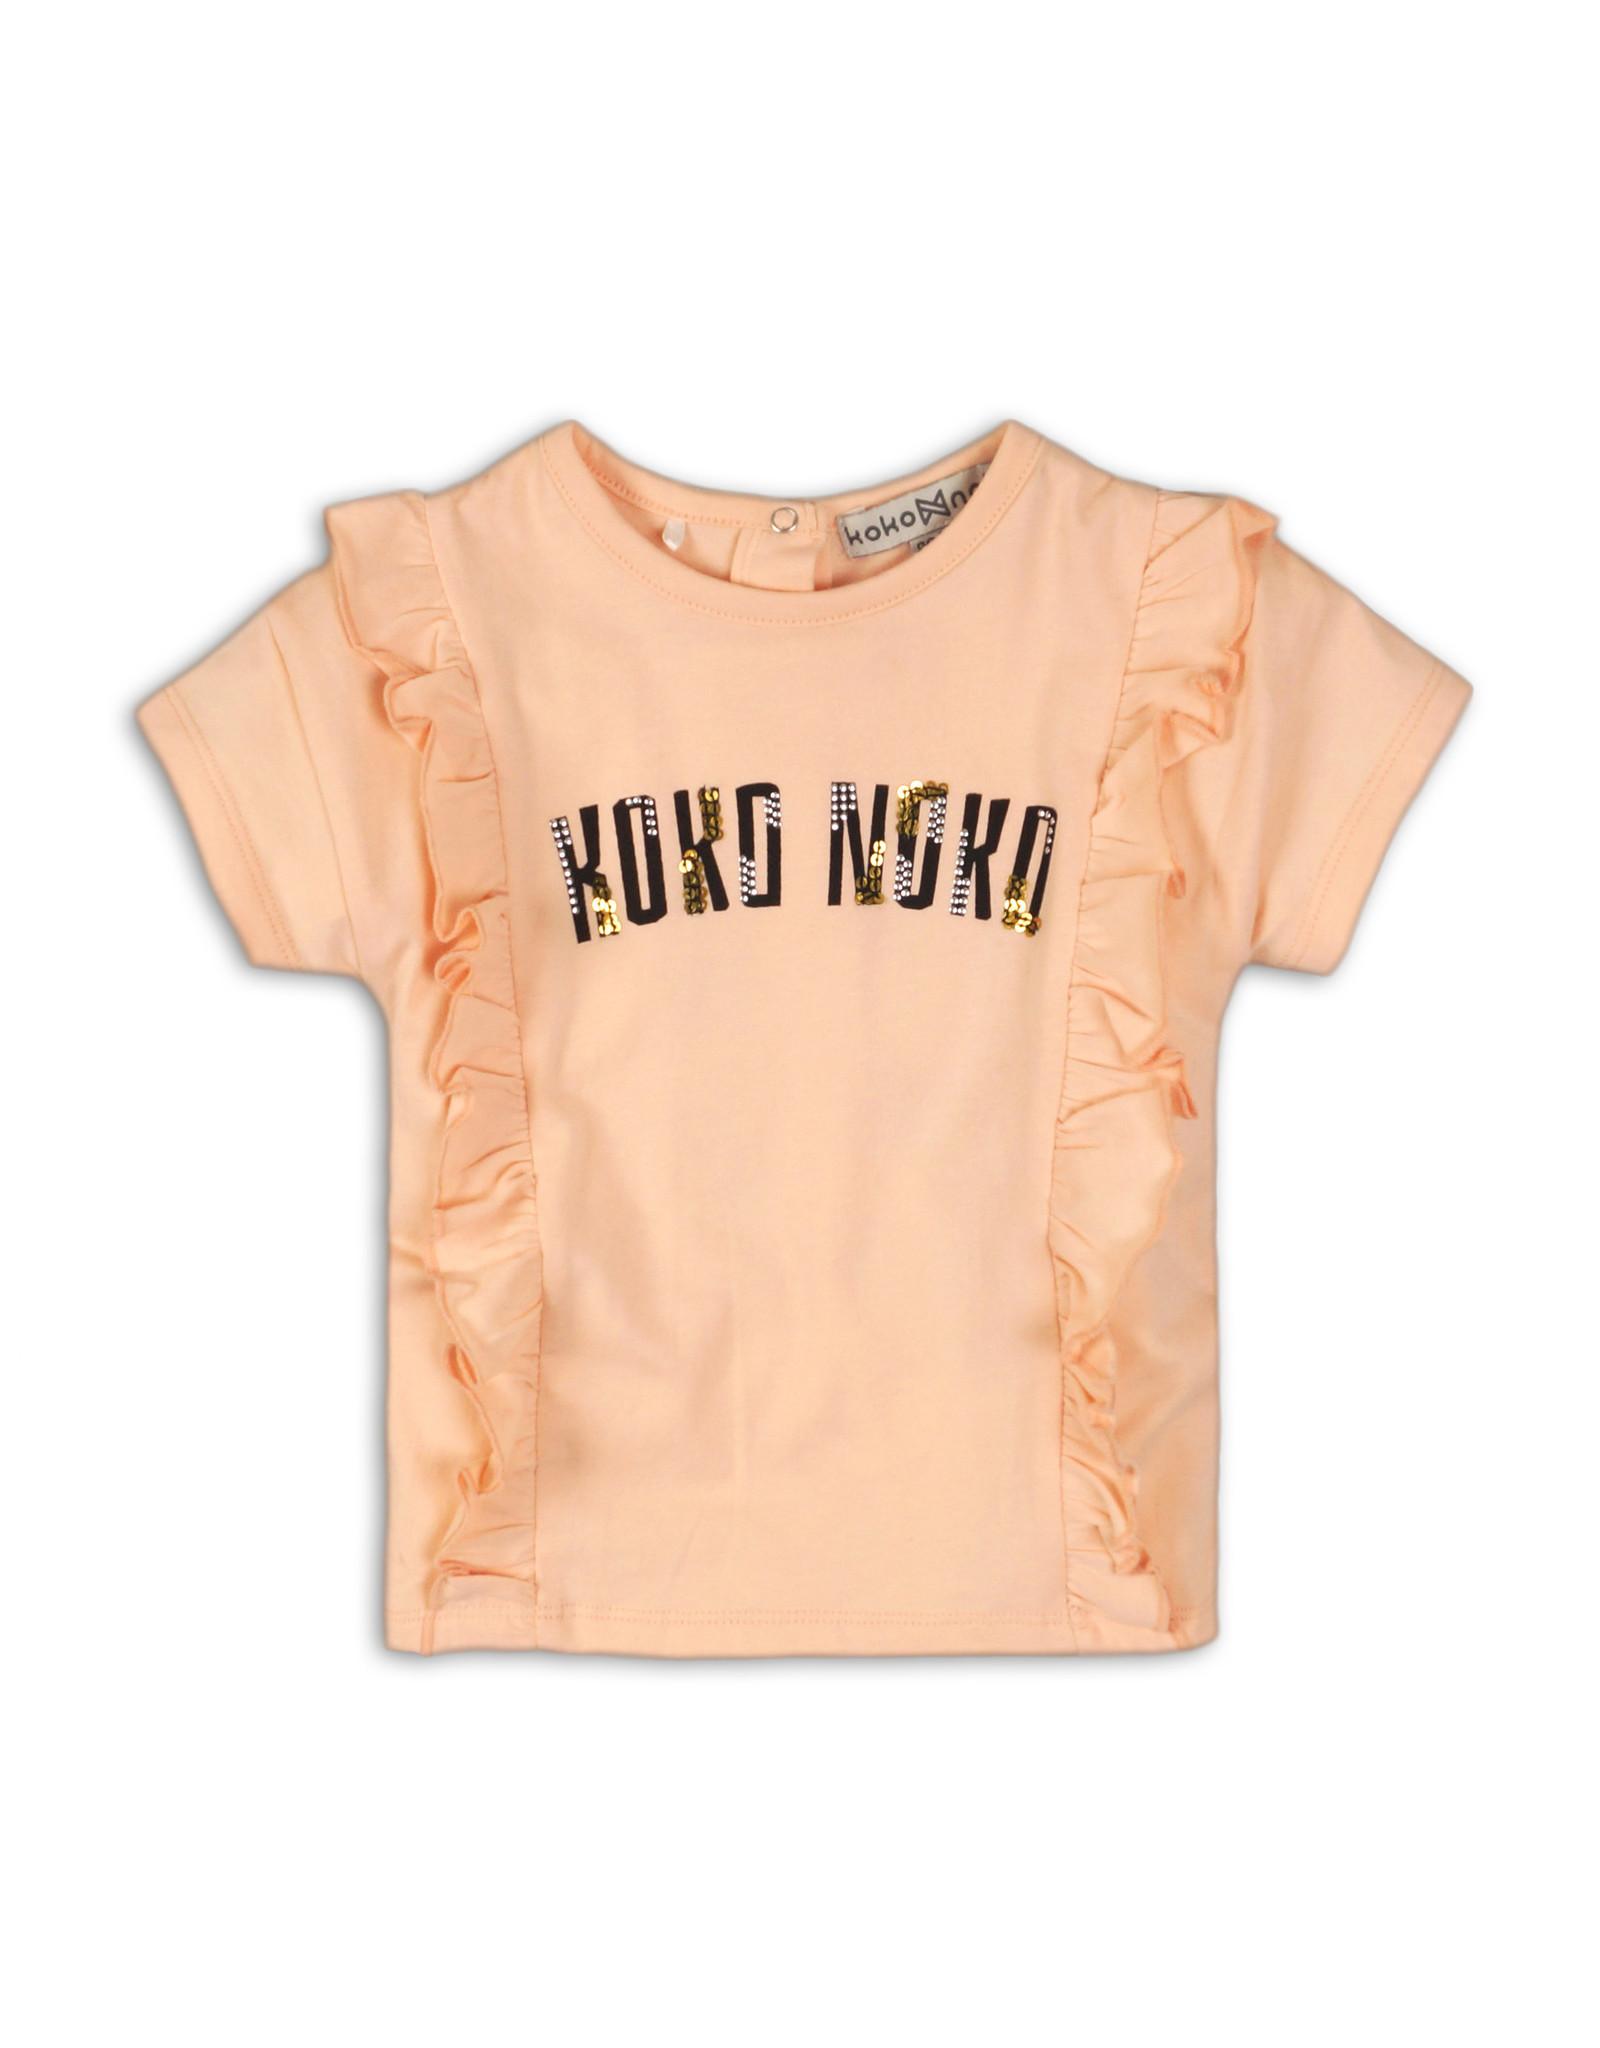 Koko Noko Koko Noko meisjes t-shirt KOKO NOKO